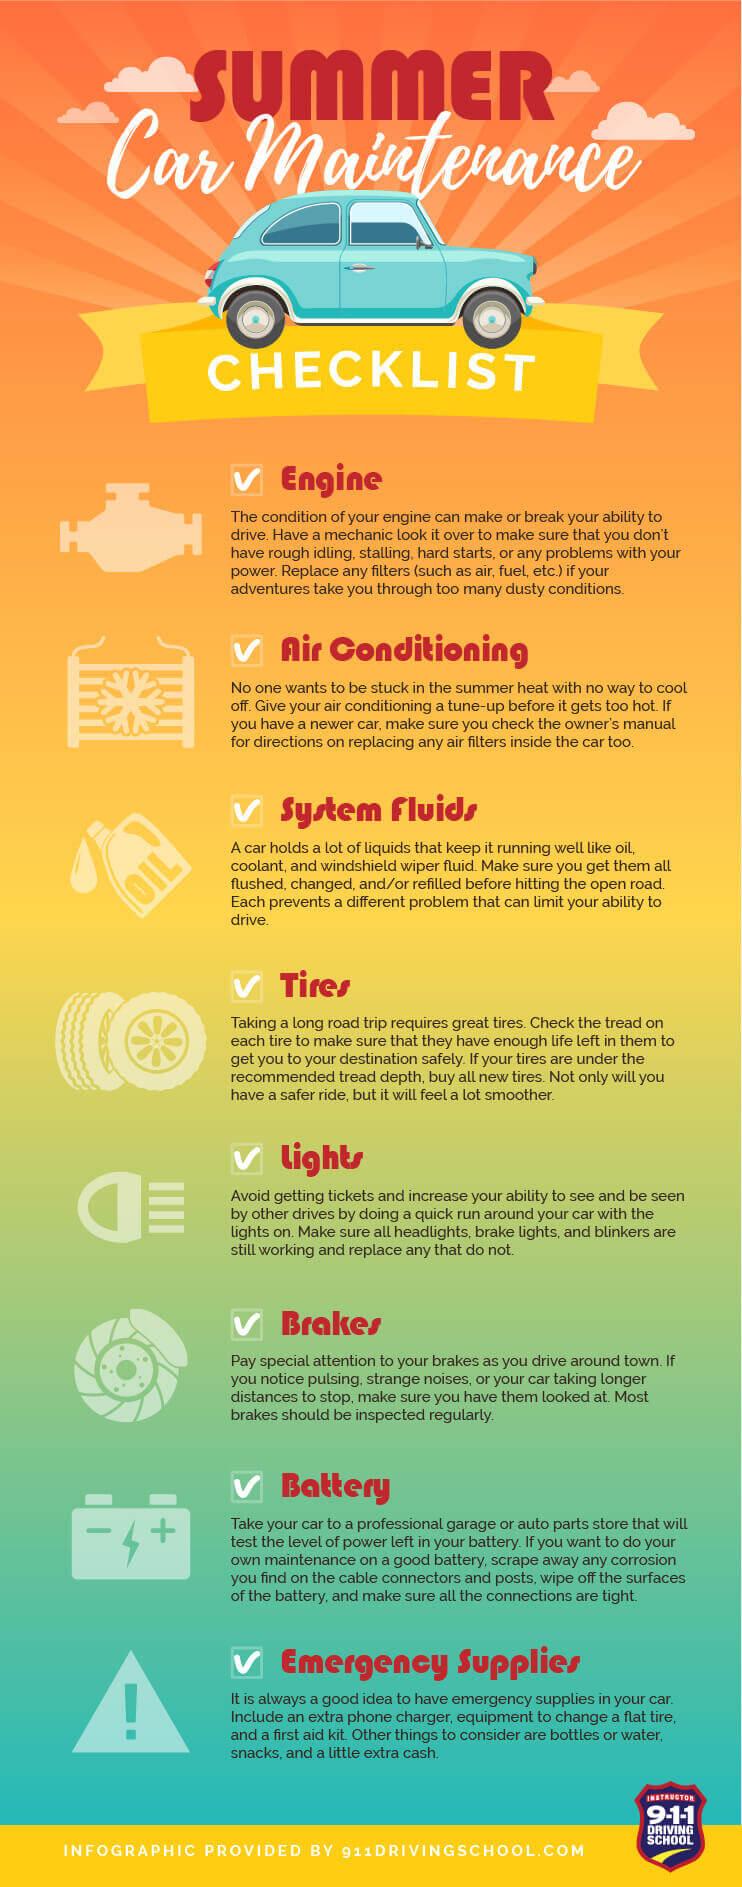 Car Maintenance Checklist >> Summer Car Maintenance Checklist | 911 Driving School